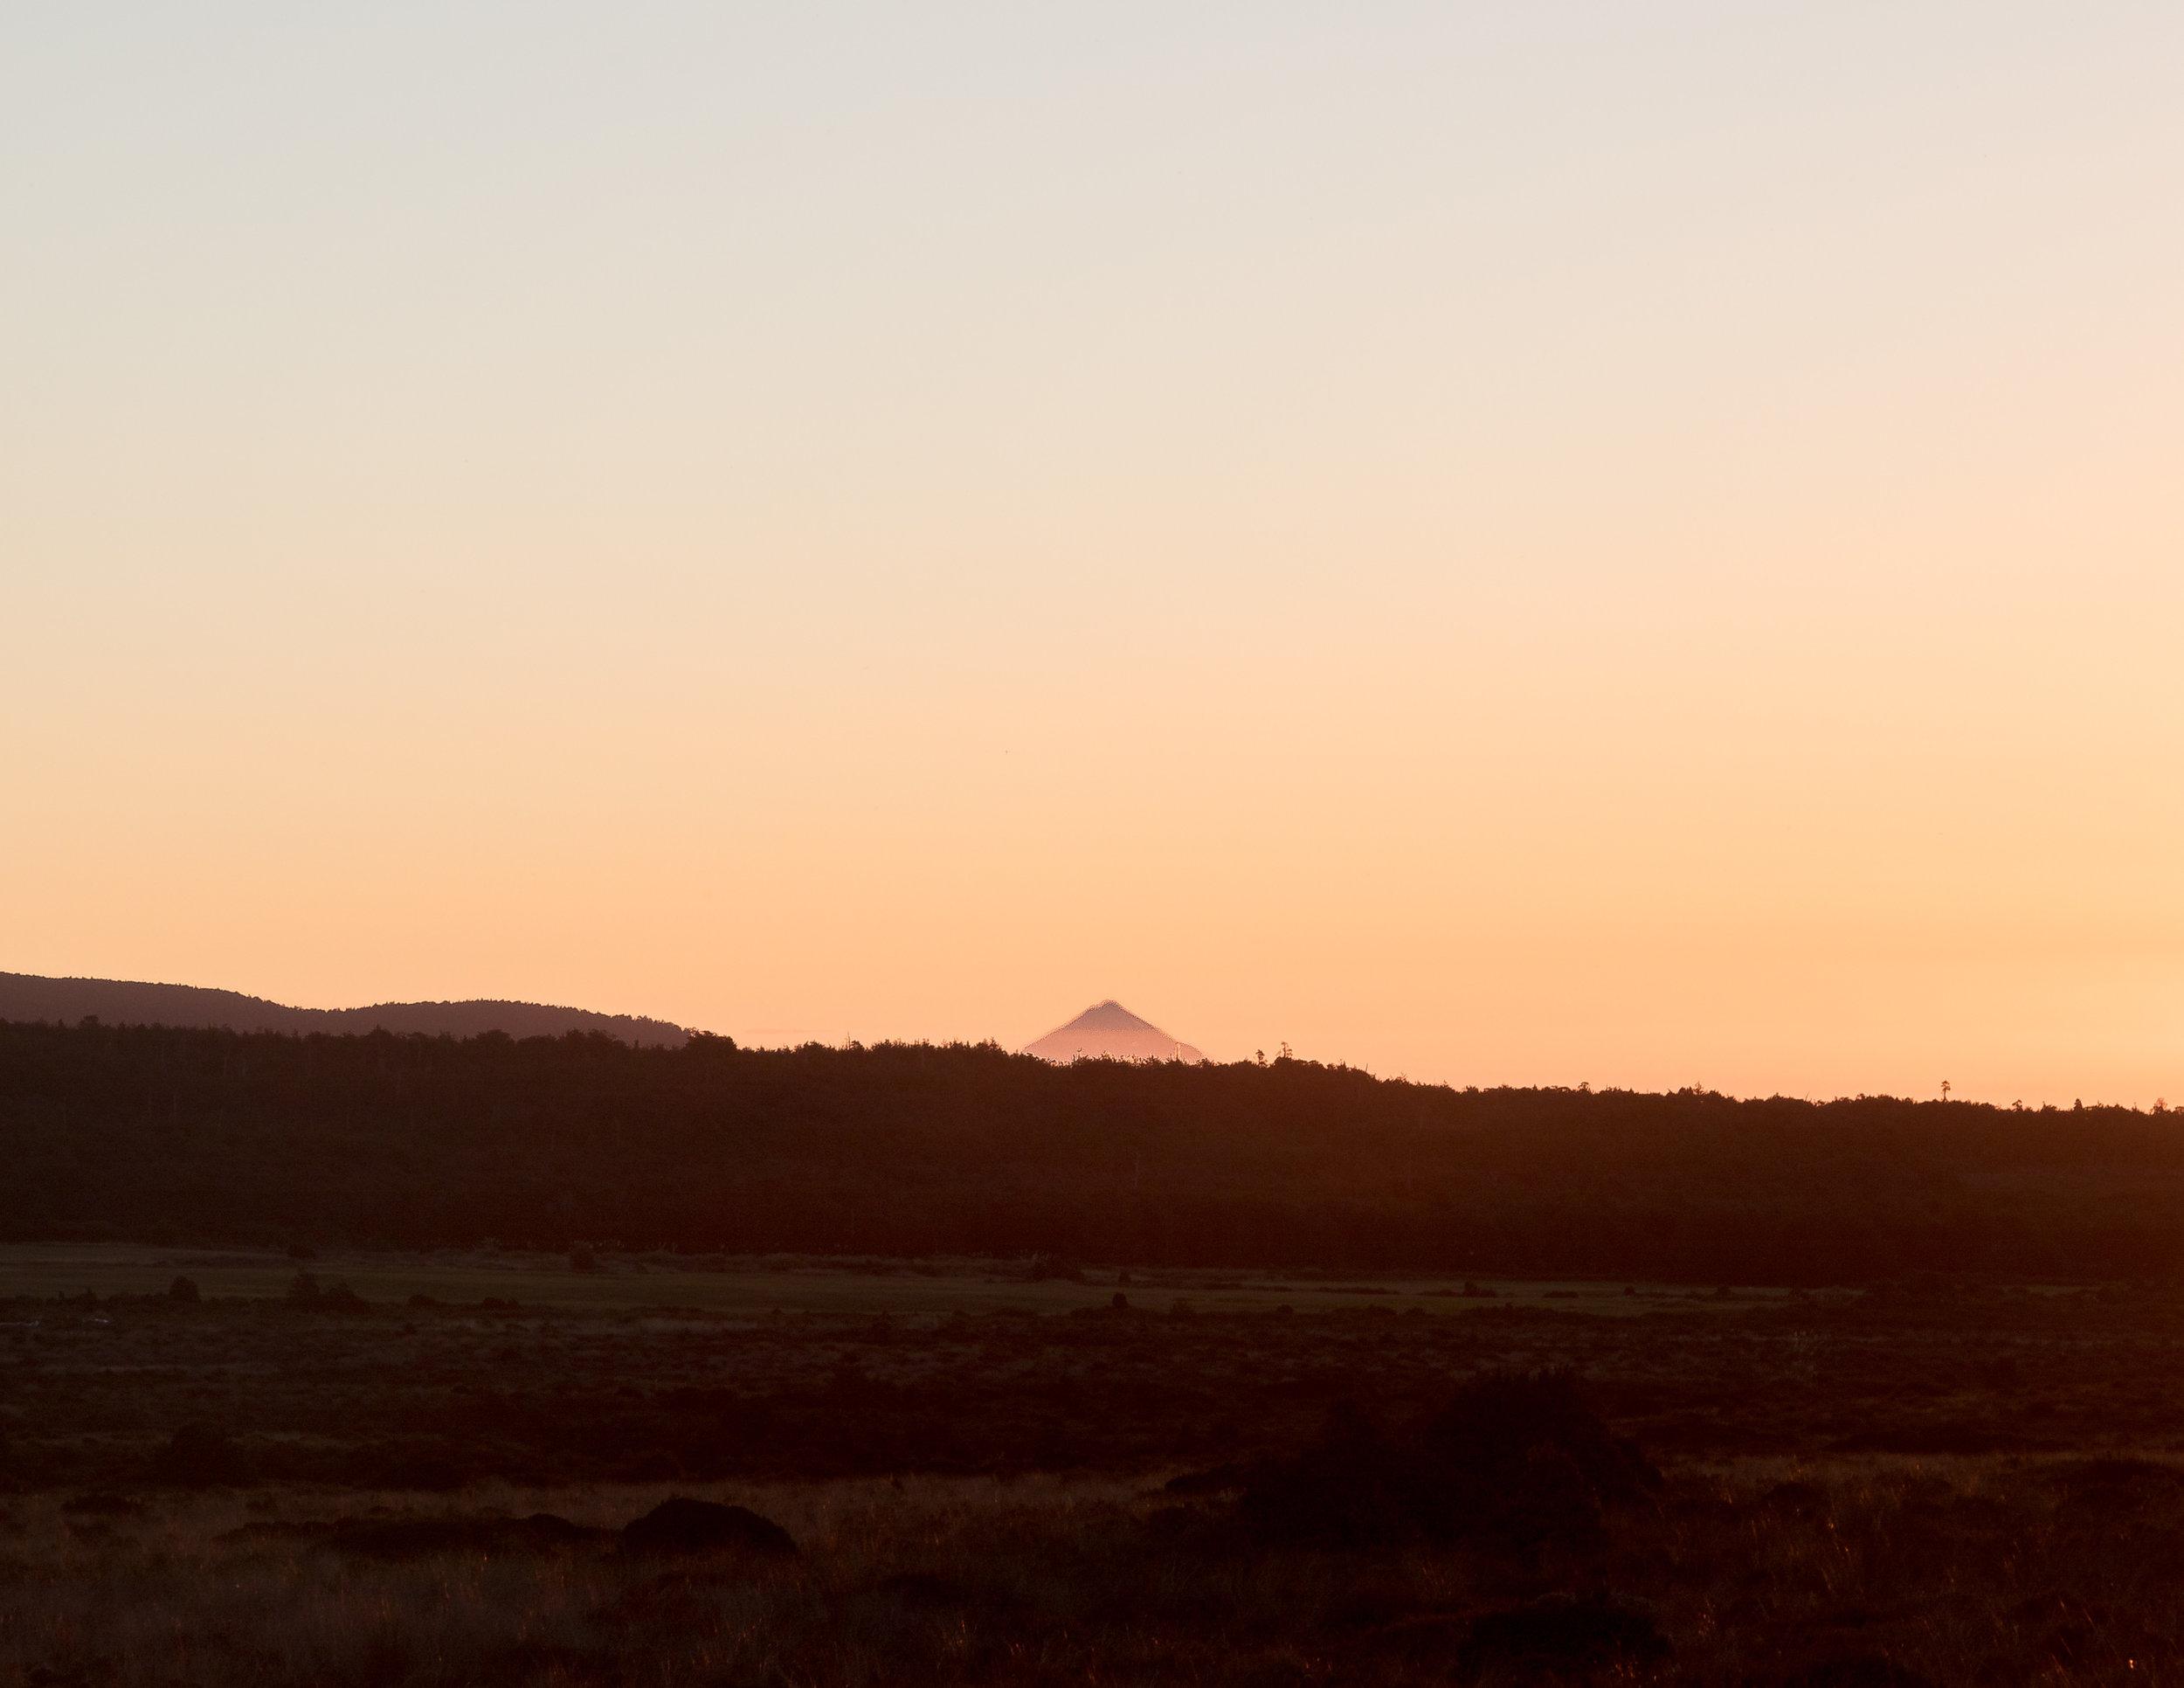 Mount Taranaki from the Tongariro Northern Circuit